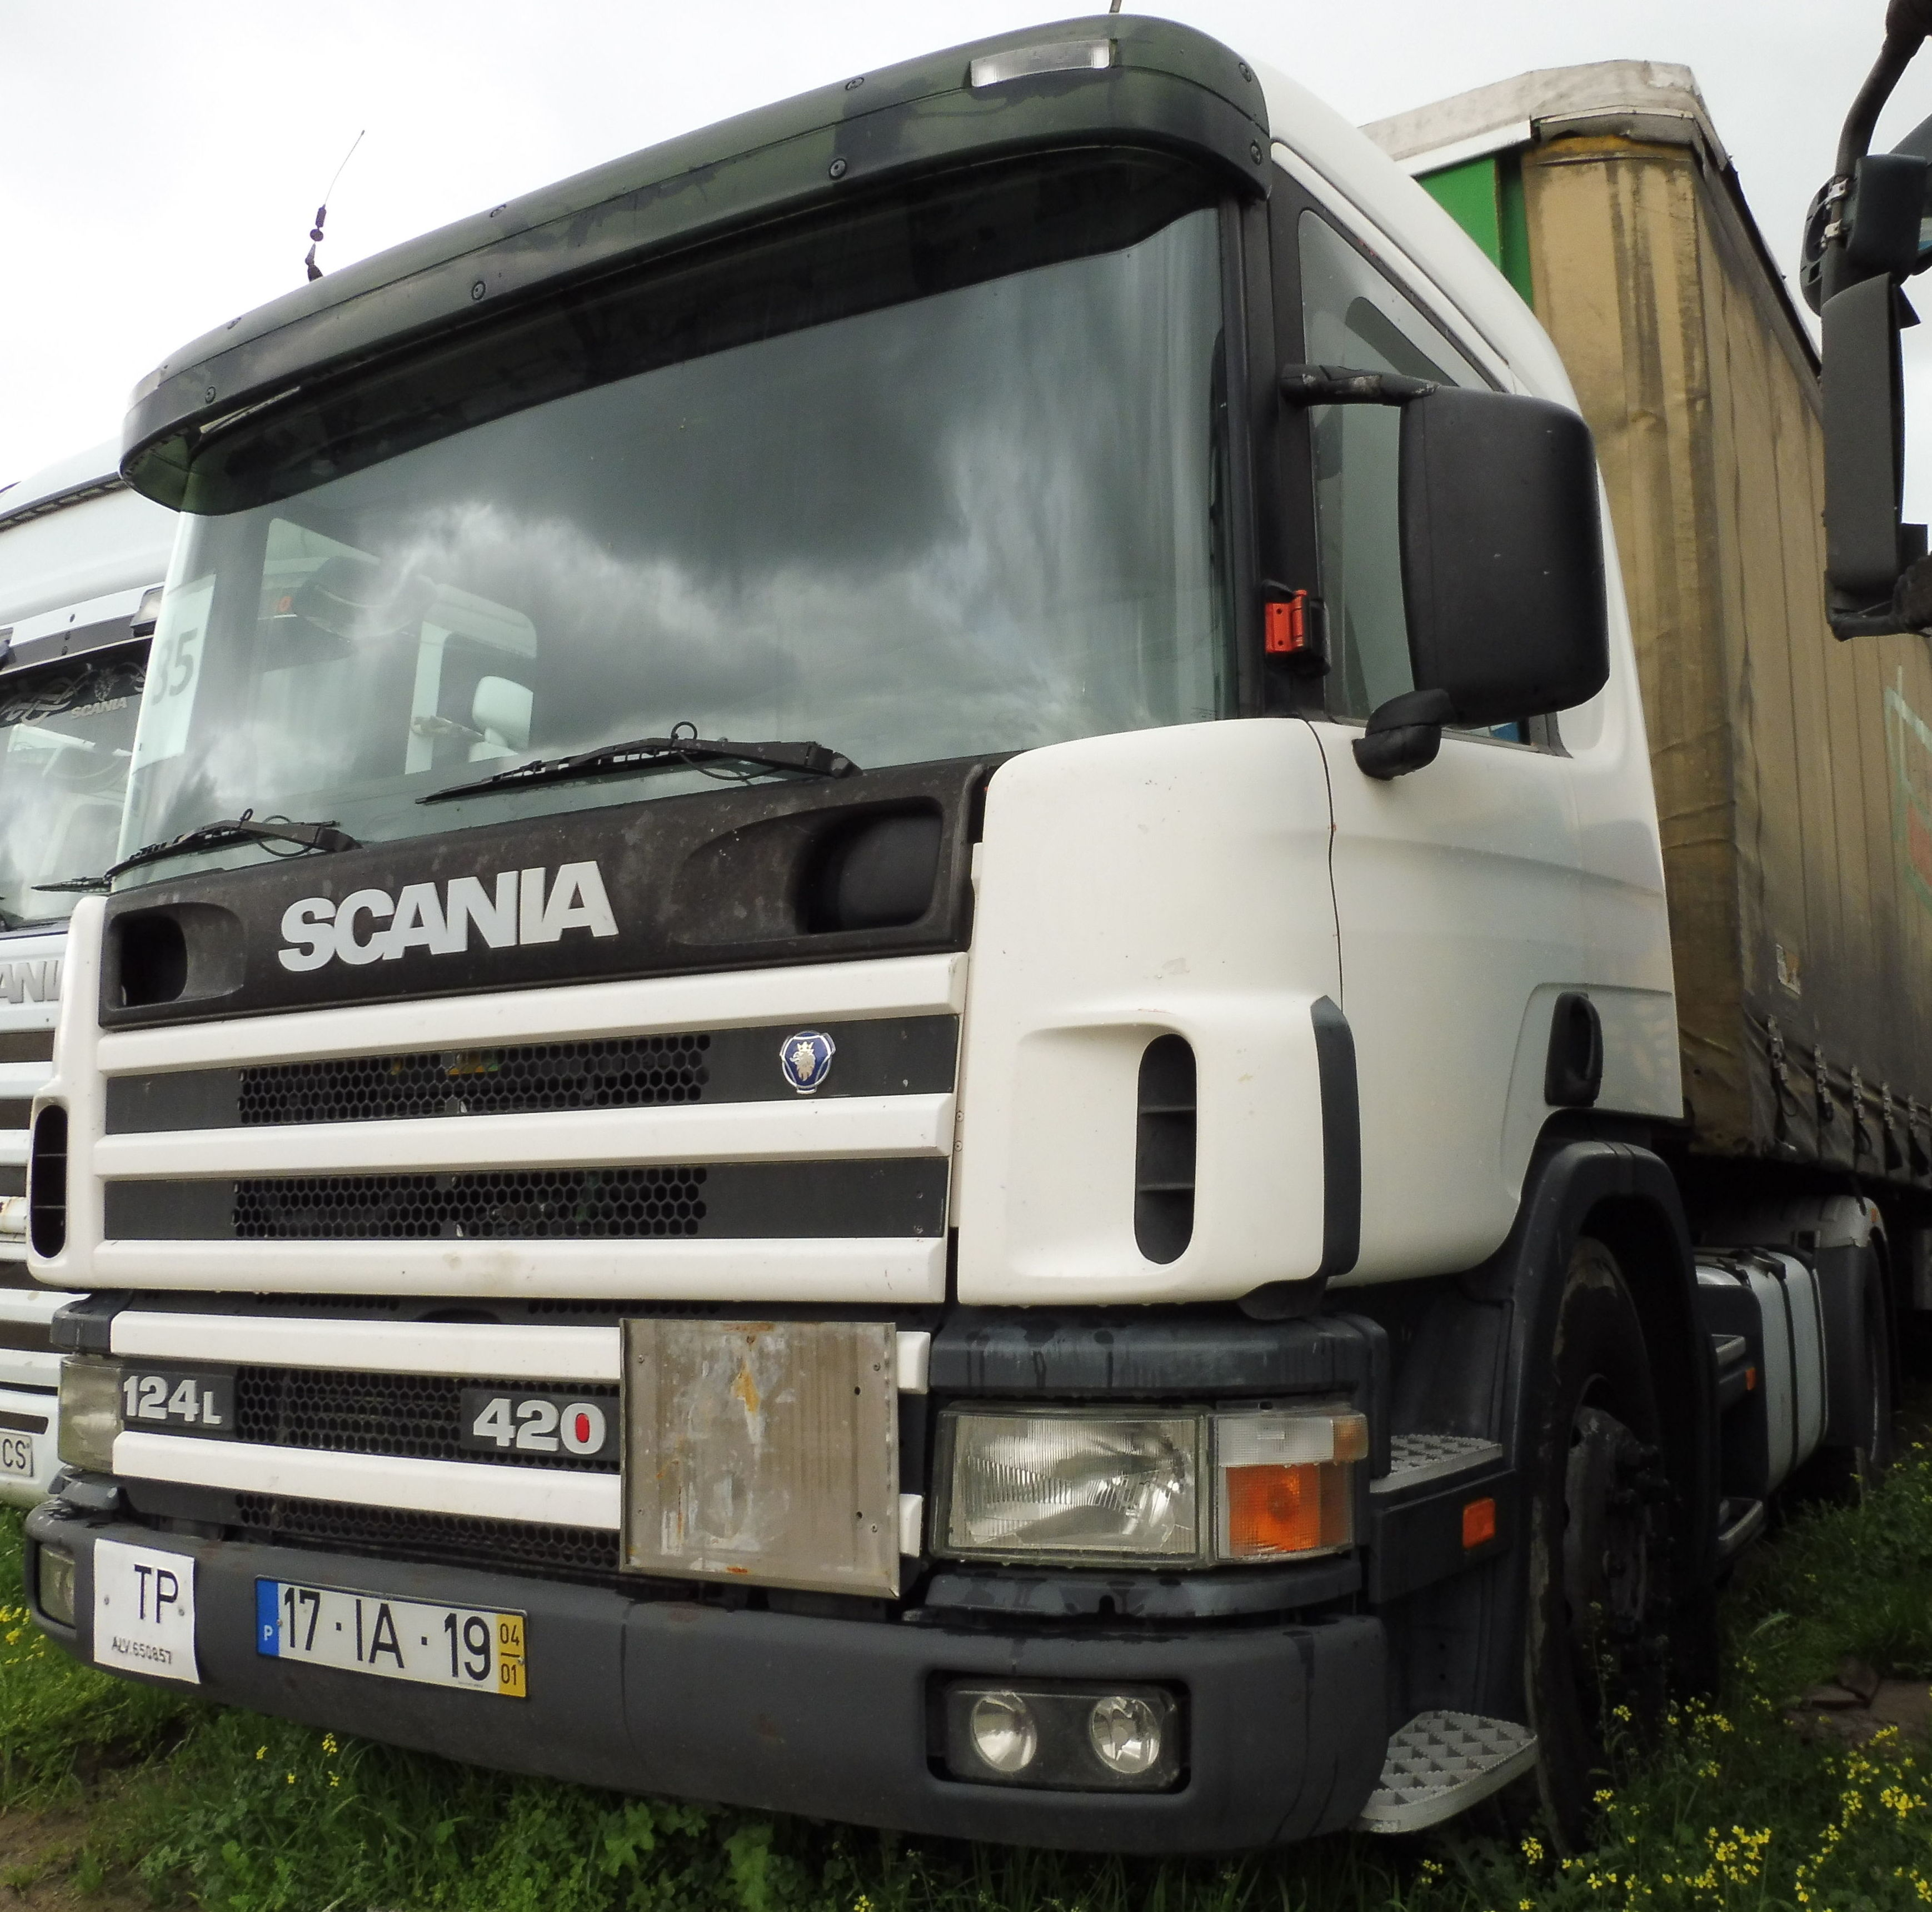 SCANIA 124L 420 4X2: Vehículos industriales de Emirtrucks Trading